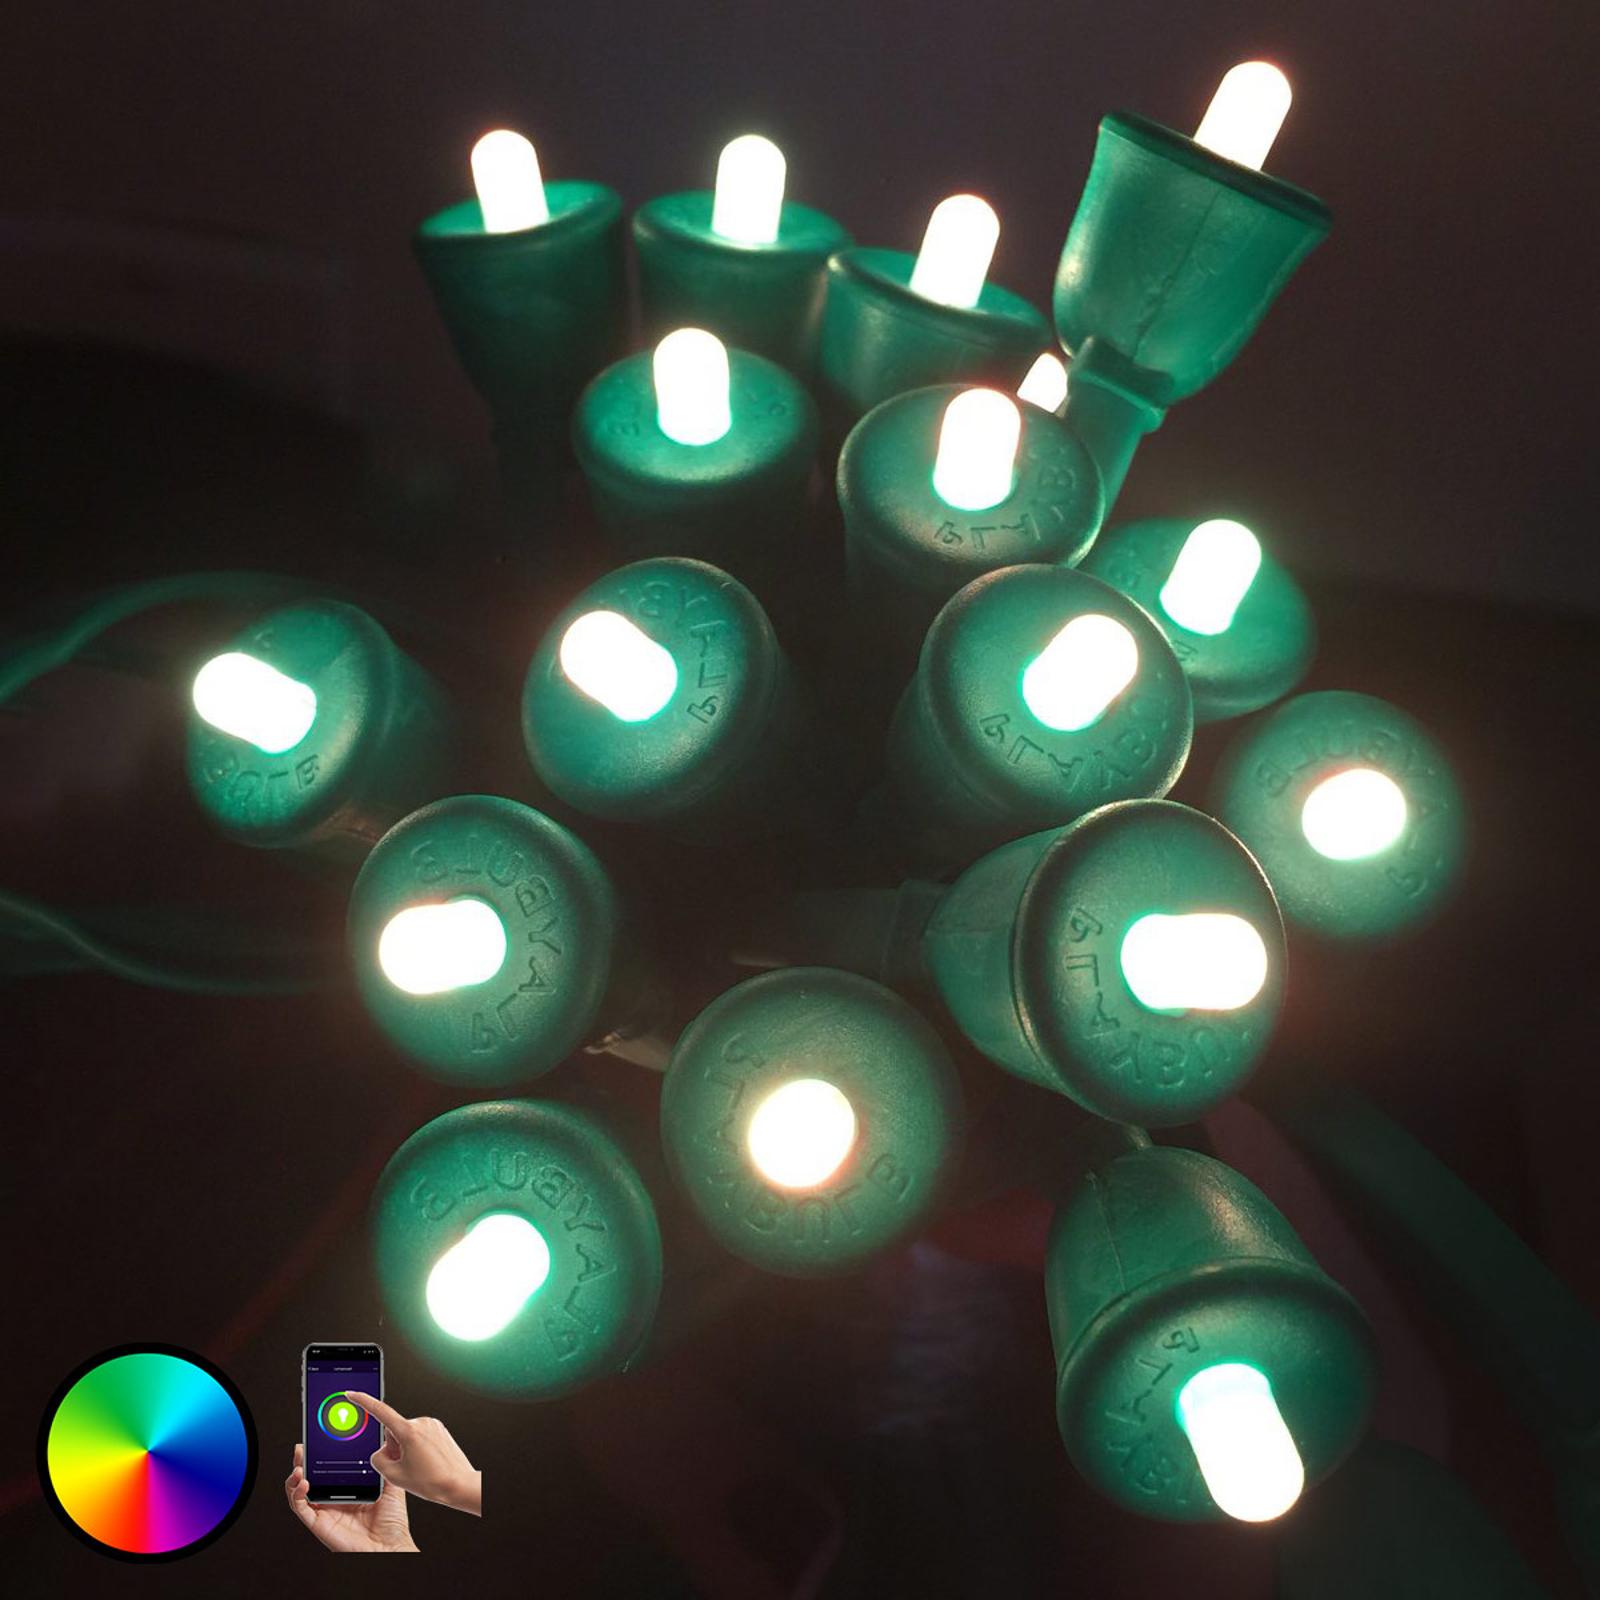 MiPow Playbulb String LED-Lichterkette 15 m, grün